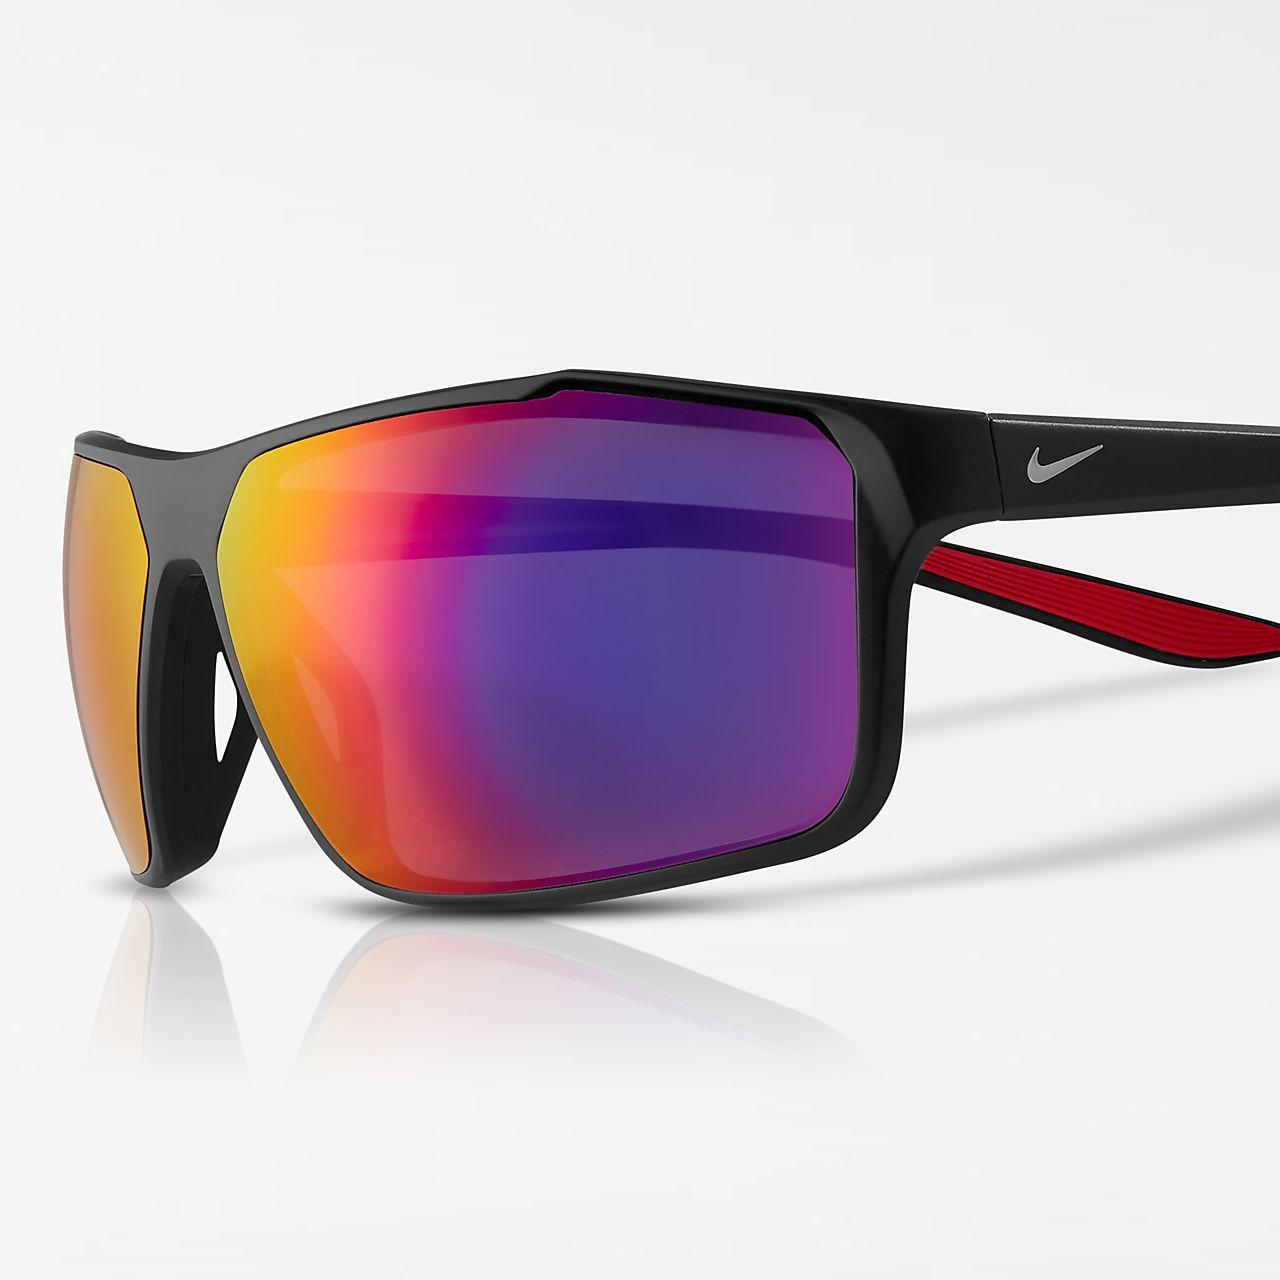 Nike Windstorm Mirrored Sunglasses